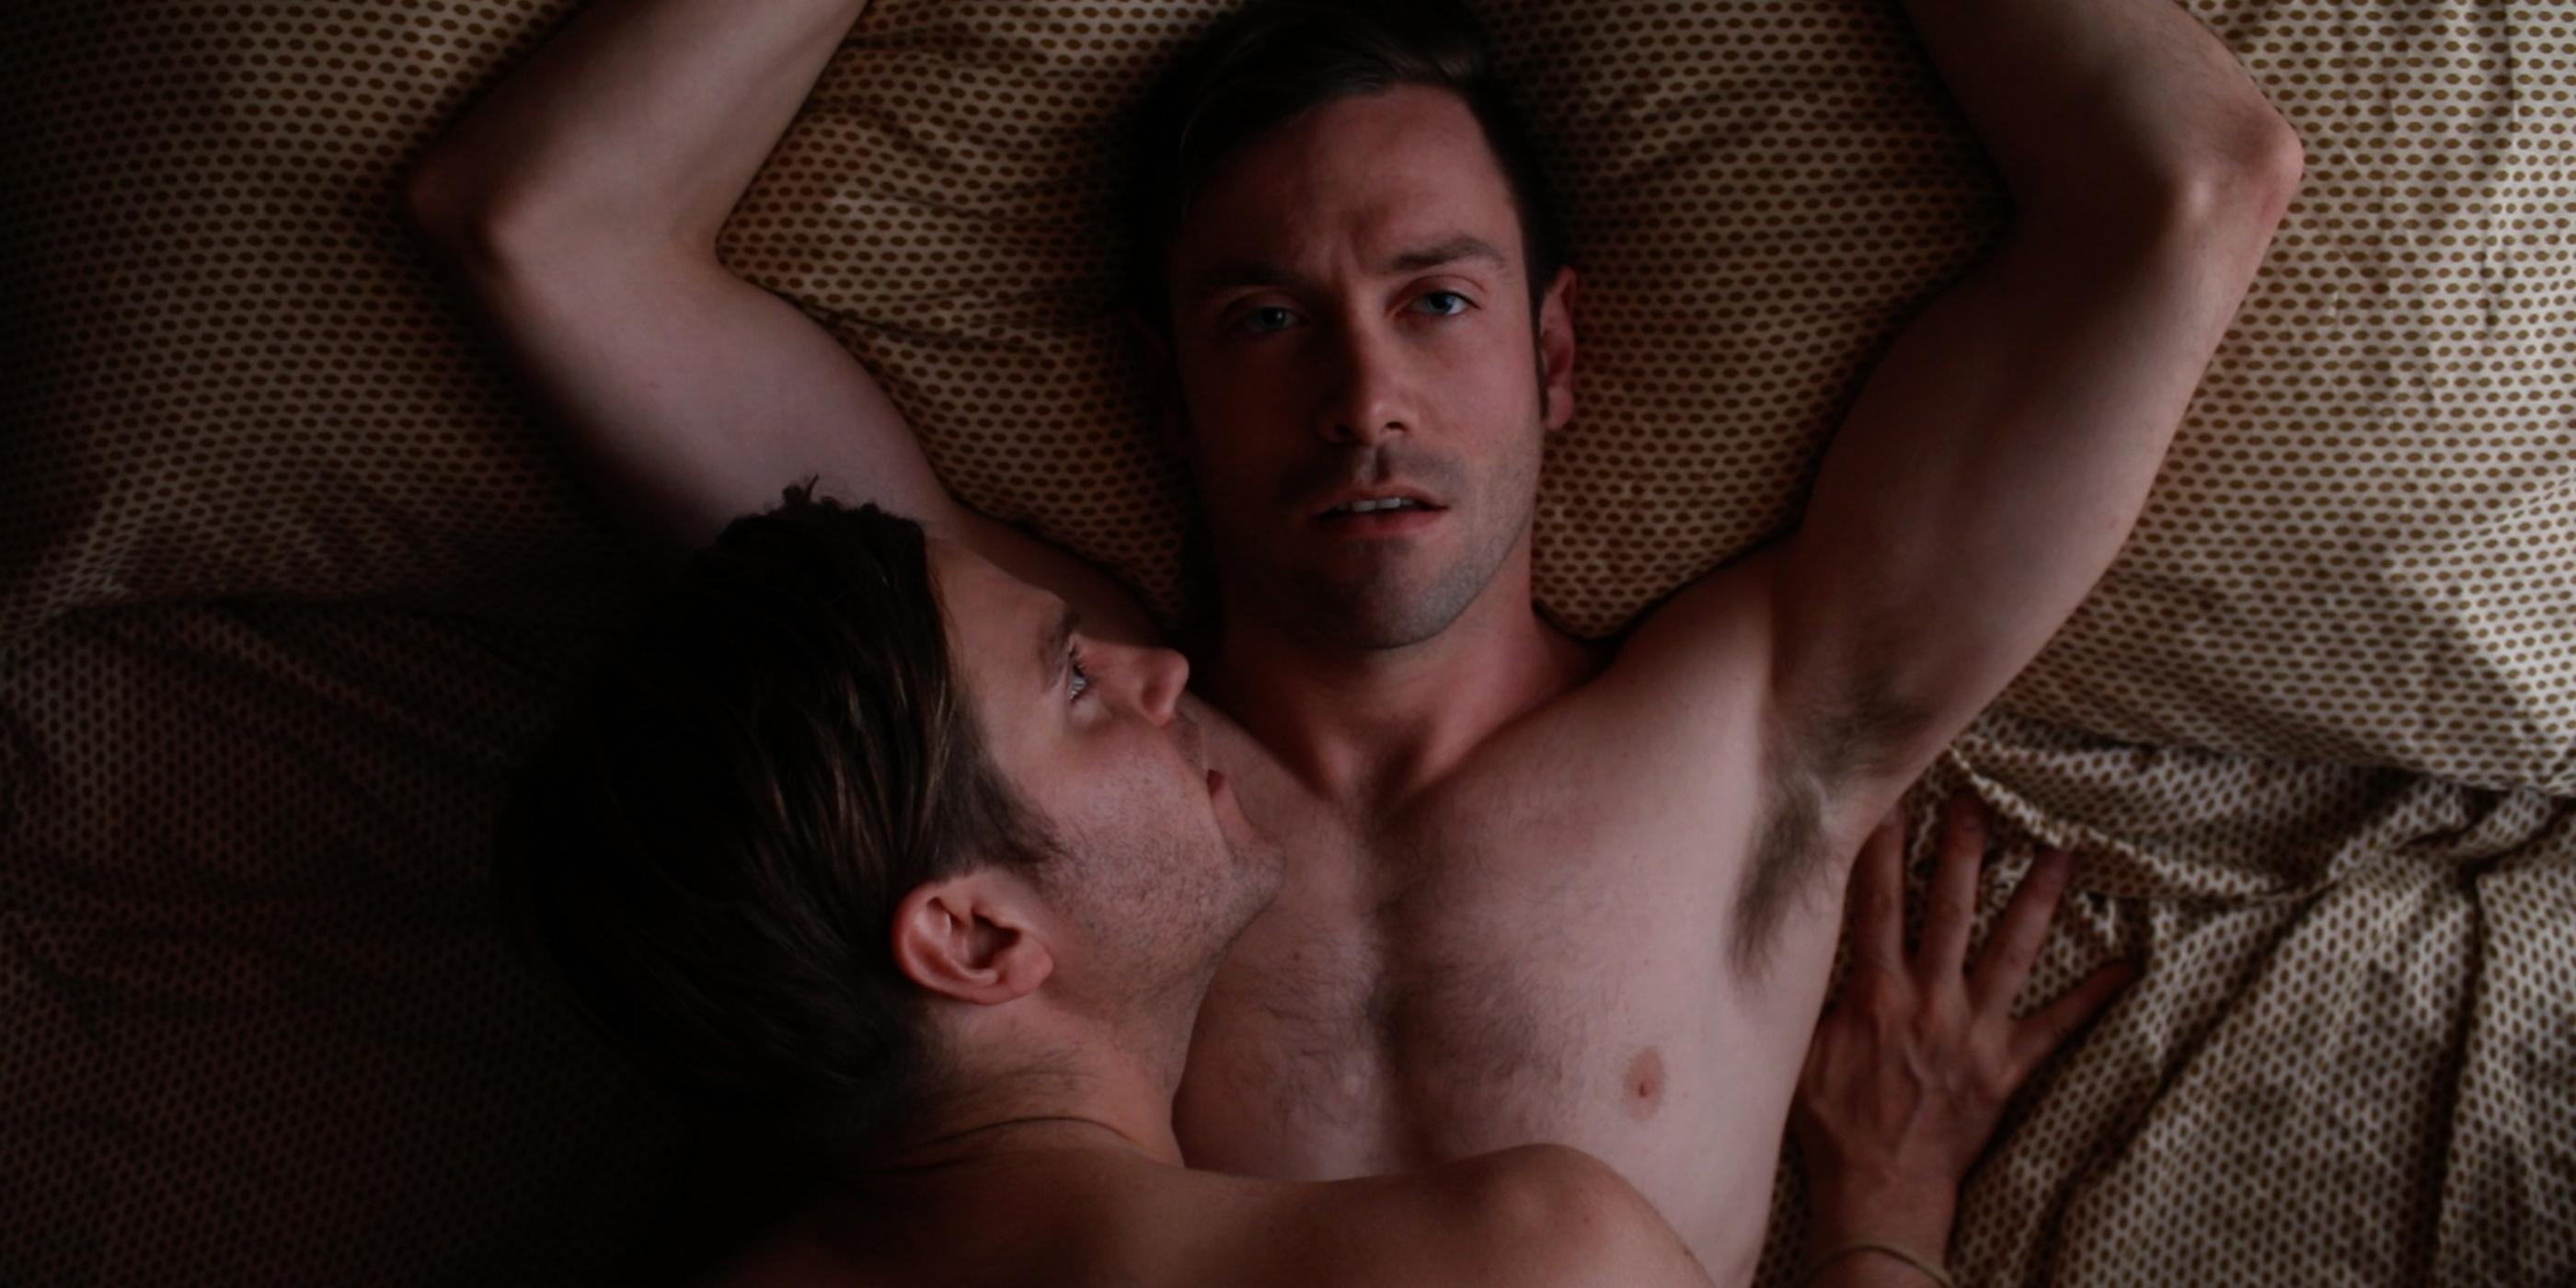 Kit Williamson, Creator of the Hit Gay Webseries 'EastSiders,' Tells Us His 5 Favorite Episodes